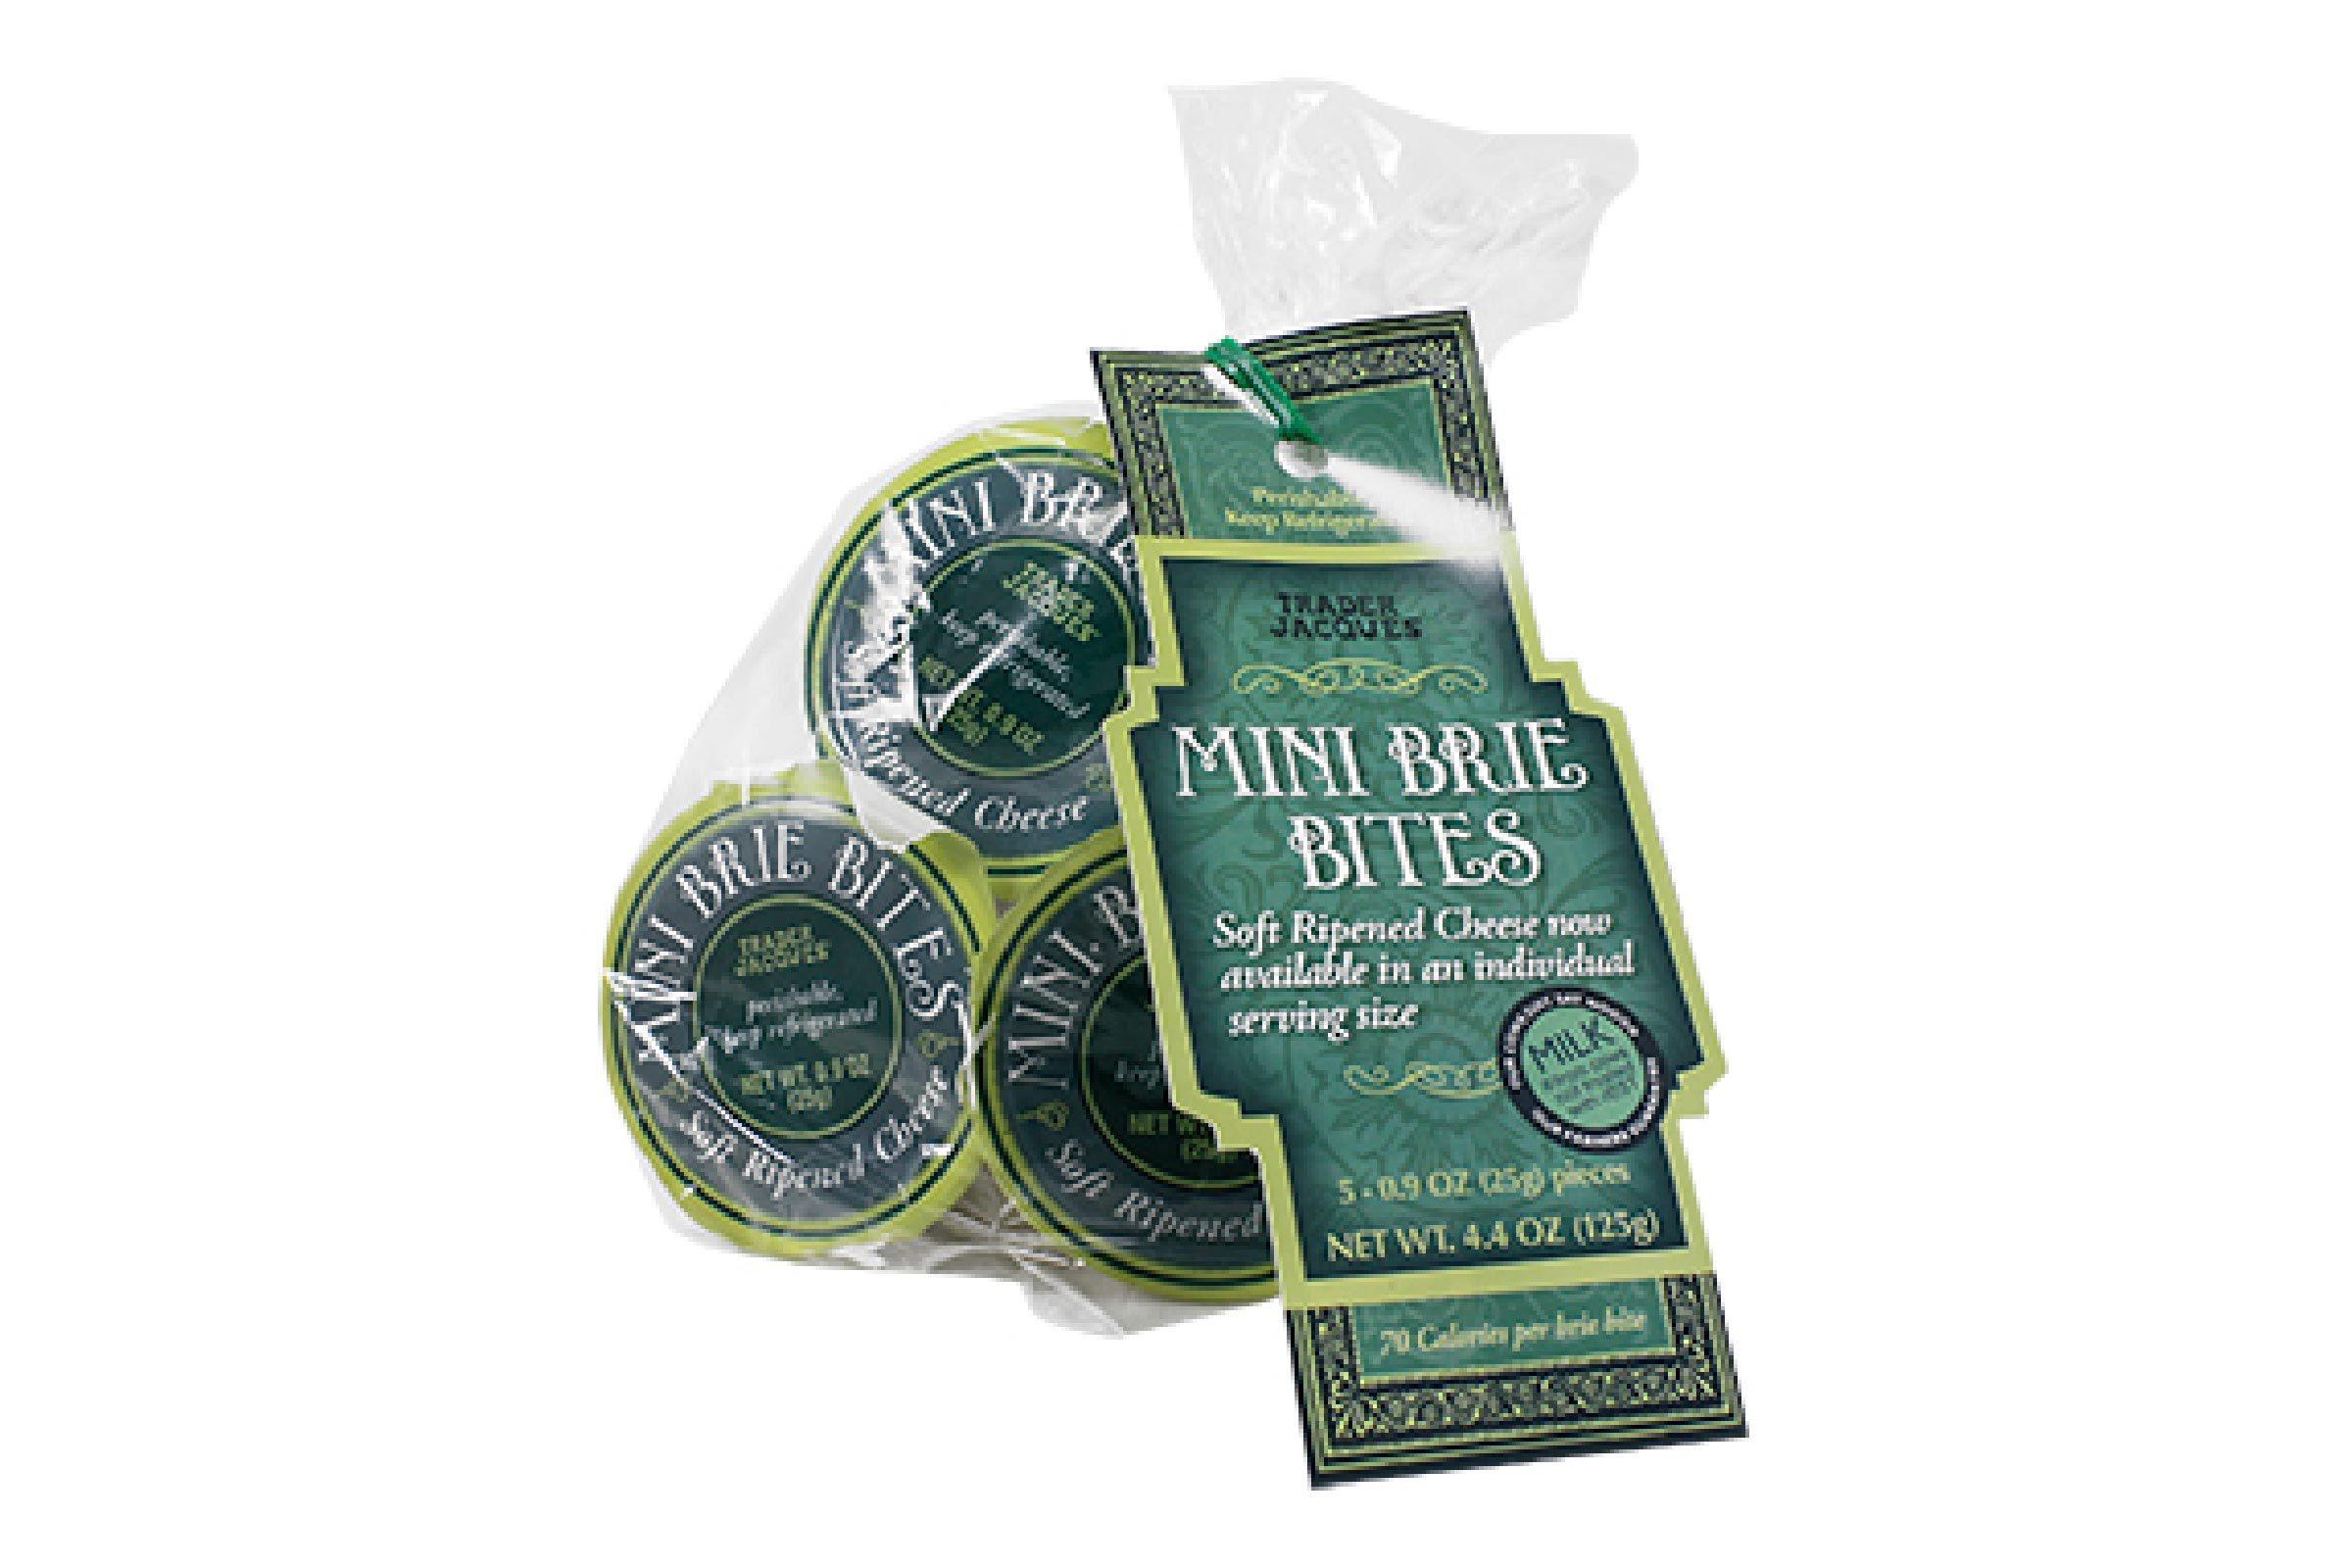 Mini Brie Bites